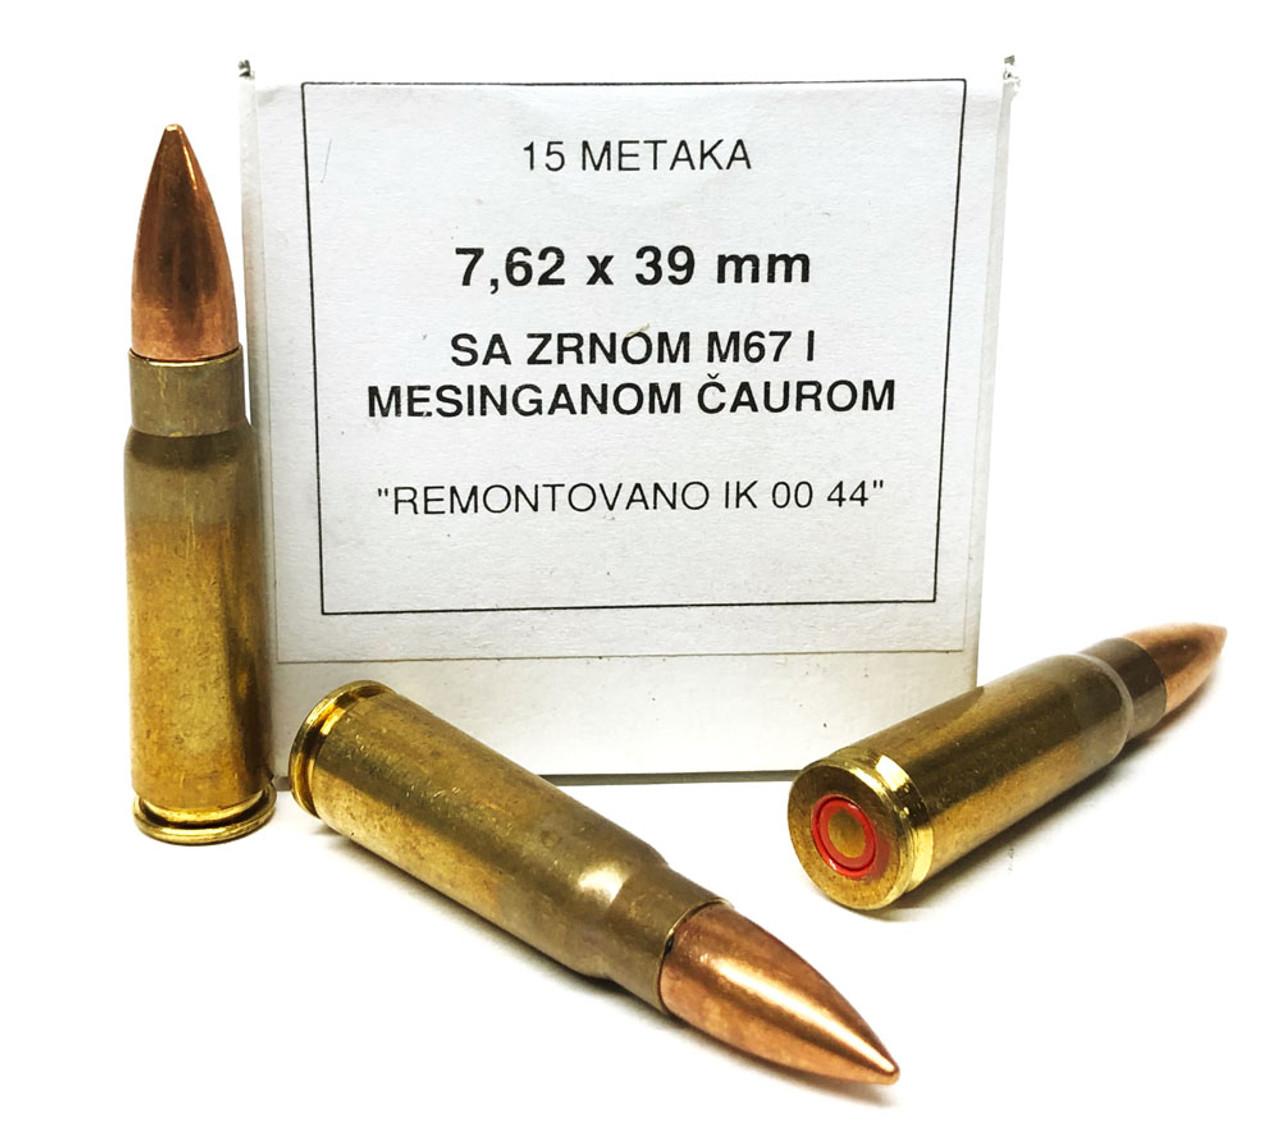 Yugo Surplus M67 7 62x39 124gr Fmj Copper Jacketed Lead Core Non Corrosive Brass Cased 600 Rds Ammunition Cheap At Surplusammo Com